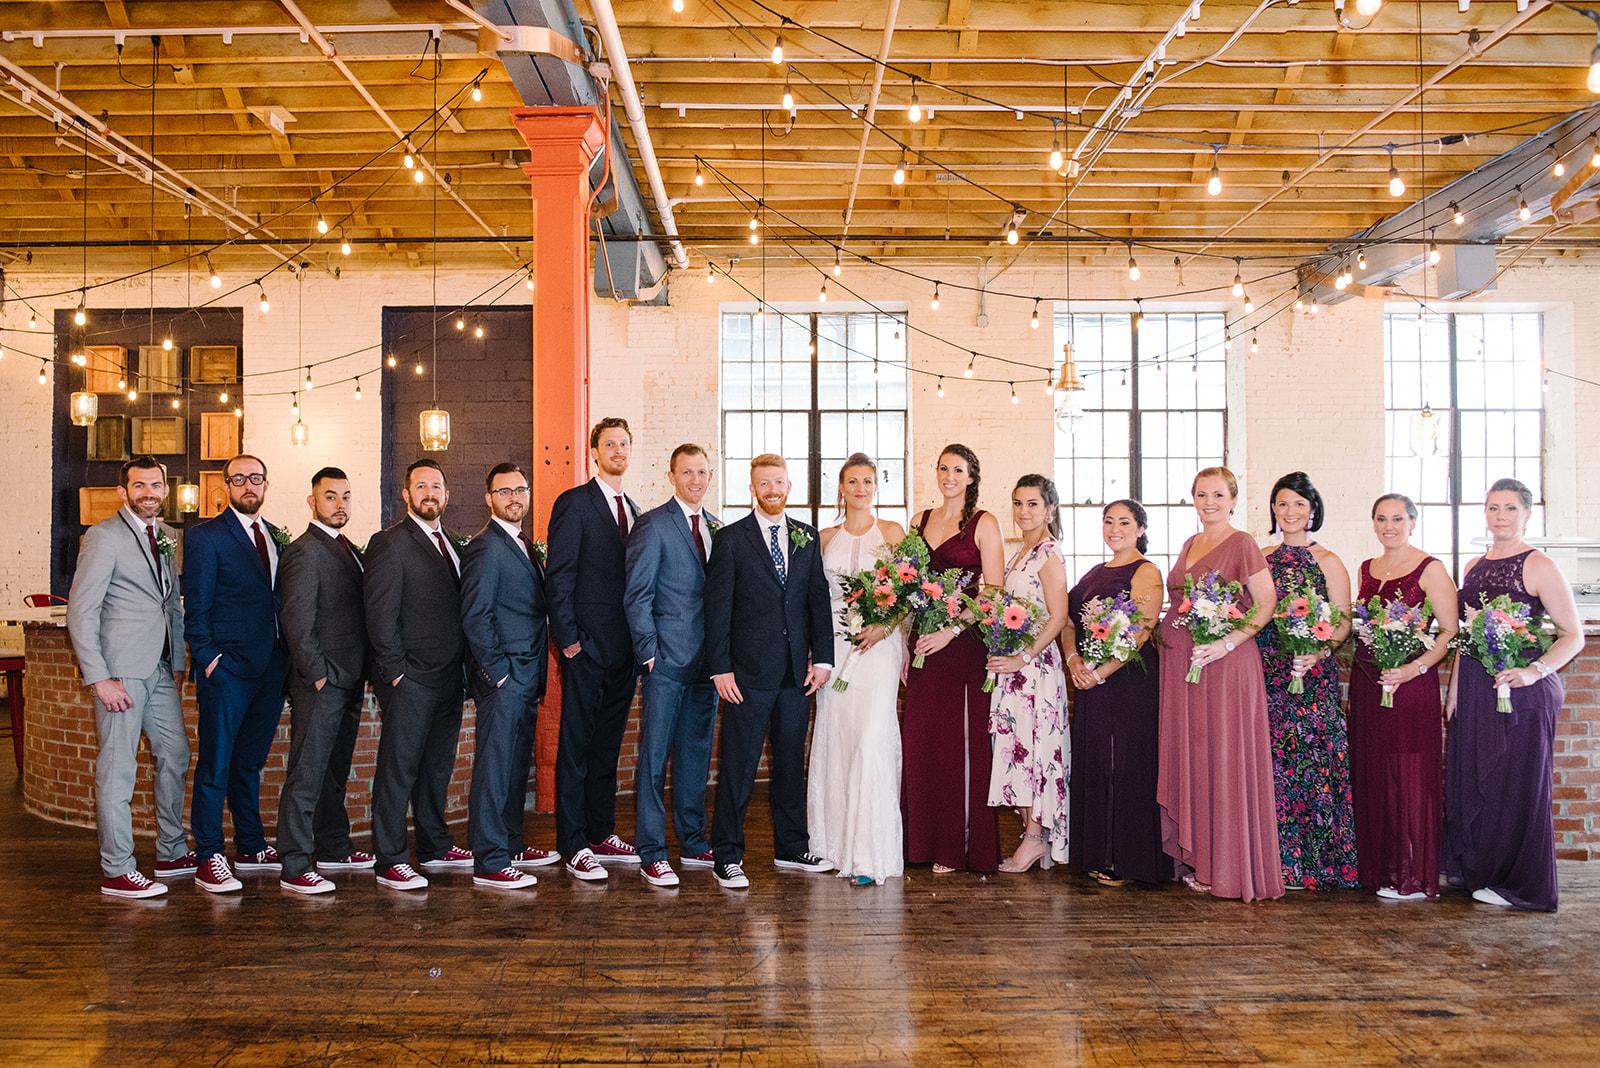 Art Factory Wedding- Audrey+Ryan-Bridal Party Photos-Paterson New York- Olivia Christina Photo (26)_websize.jpg